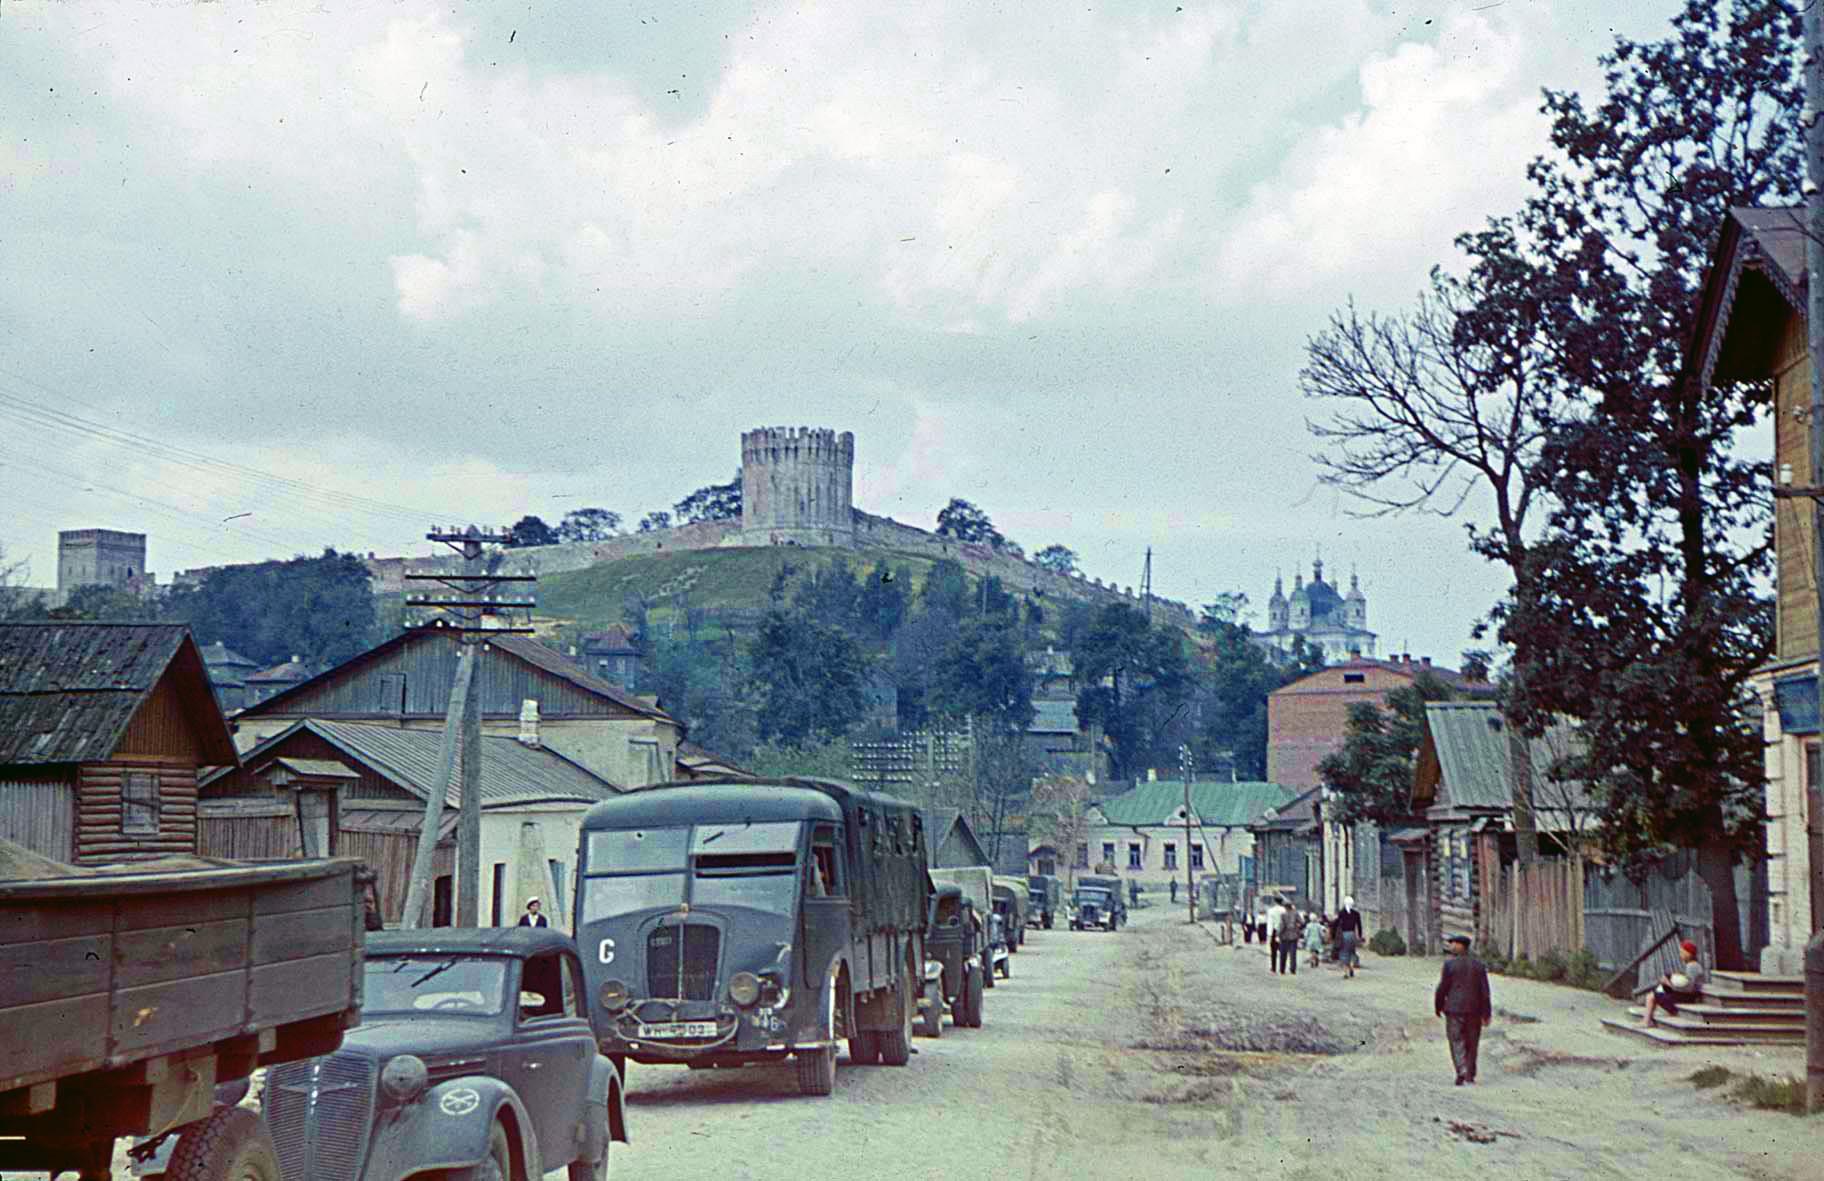 Смоленск в августе 1941-го 1941 Deutsche Militaerfahrzeuge, Smolensk, August 1941f